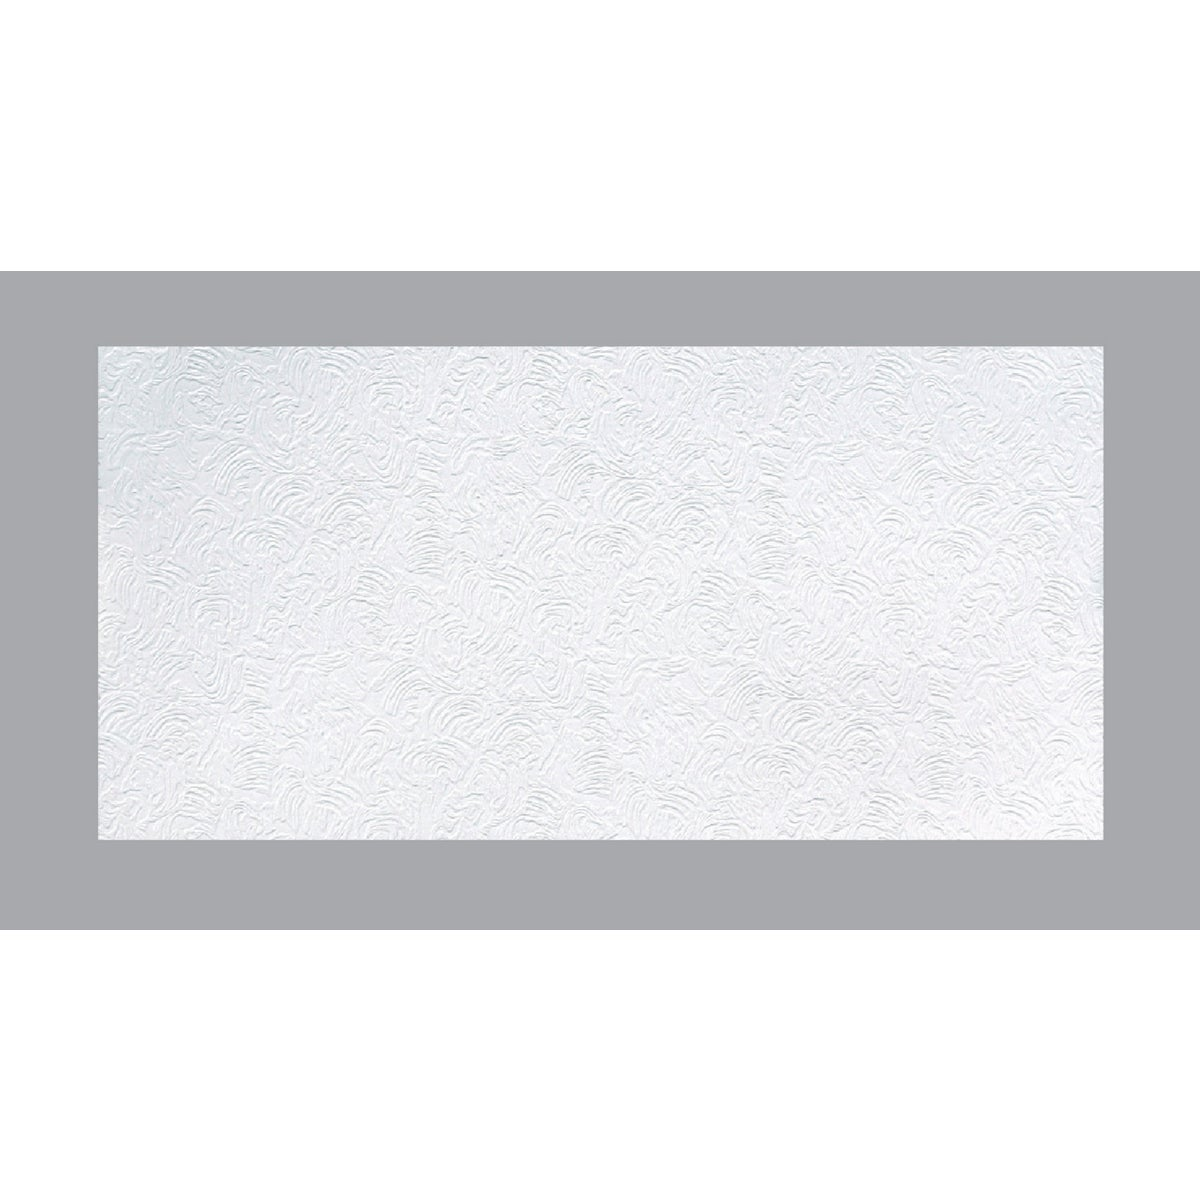 Caravelle Wood Fiber Suspended Ceiling Panel